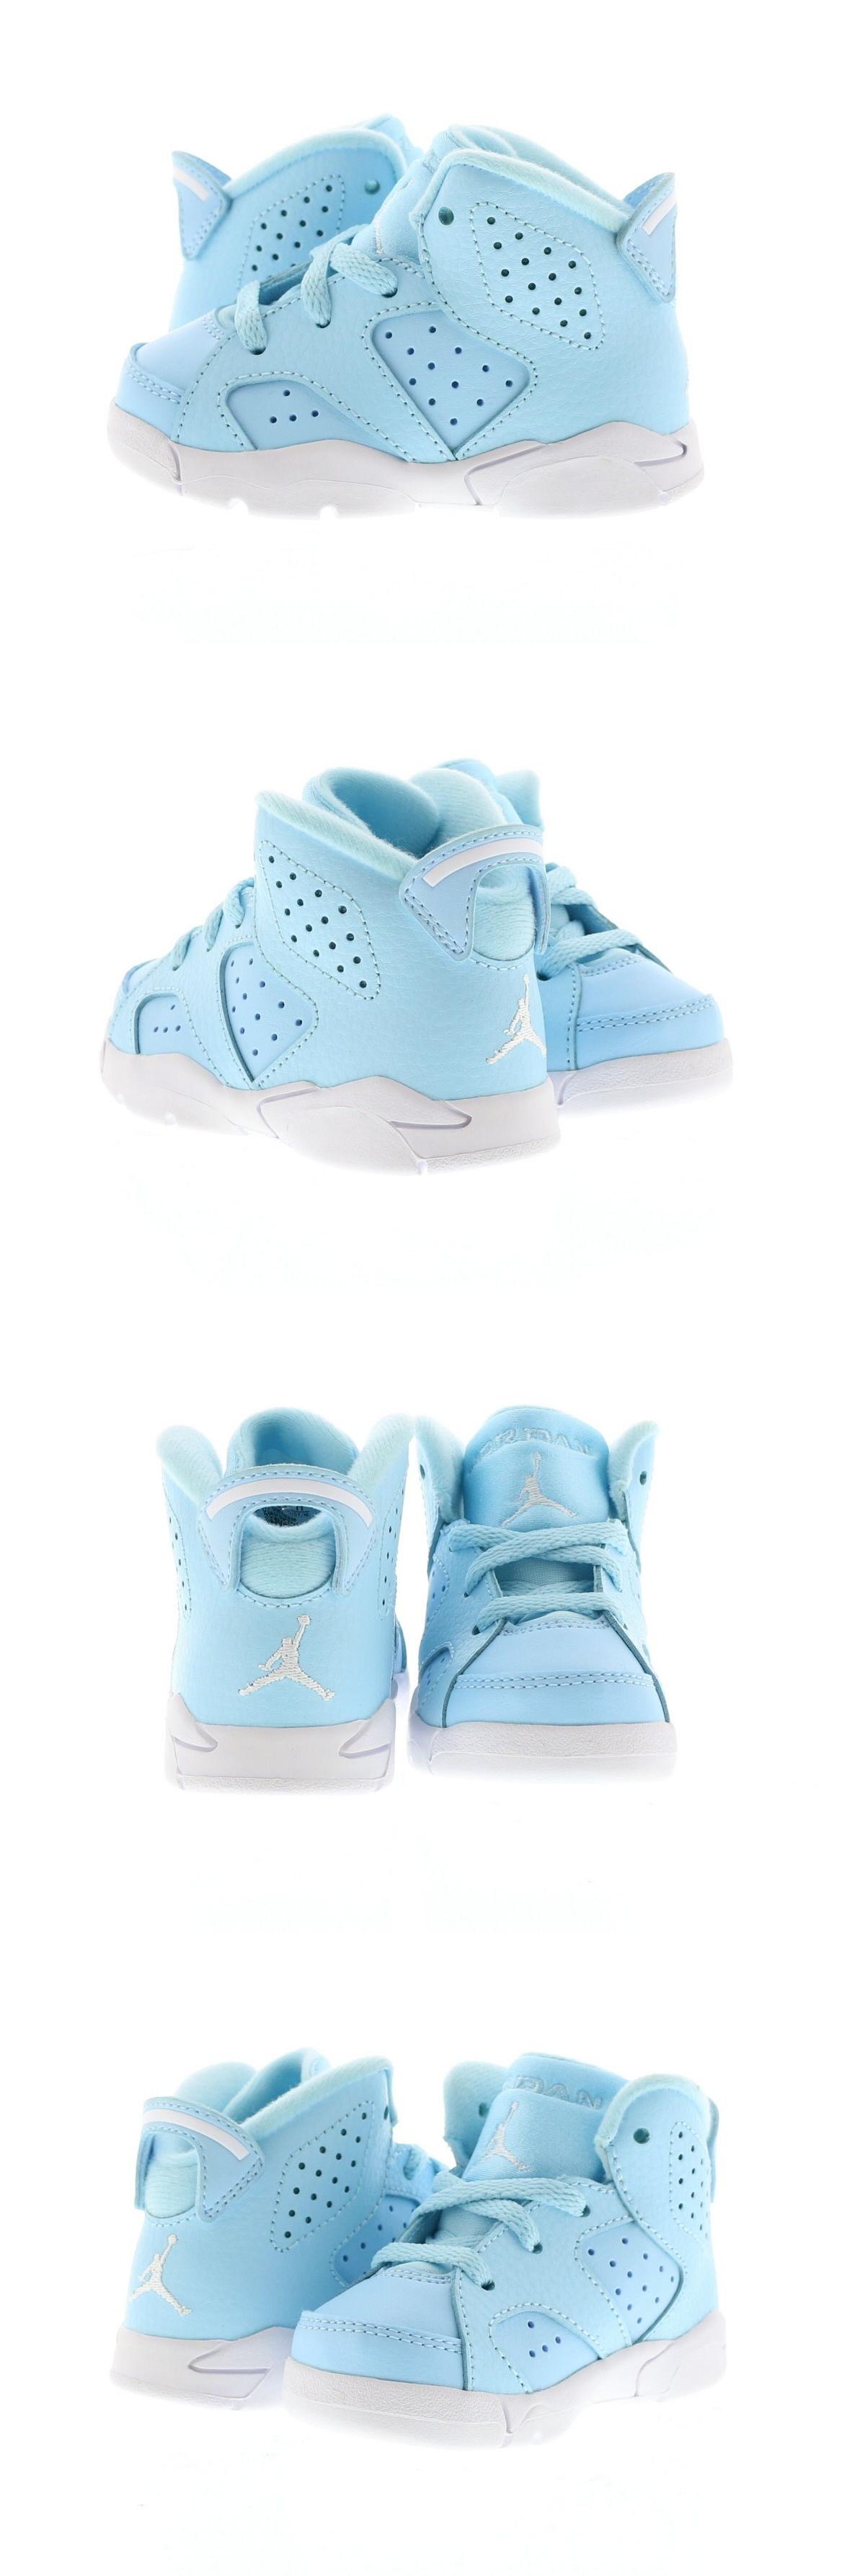 06520b3f7946ec Baby Shoes 147285  Infant (Td) Air Jordan 6 Retro Pantone Still Blue White